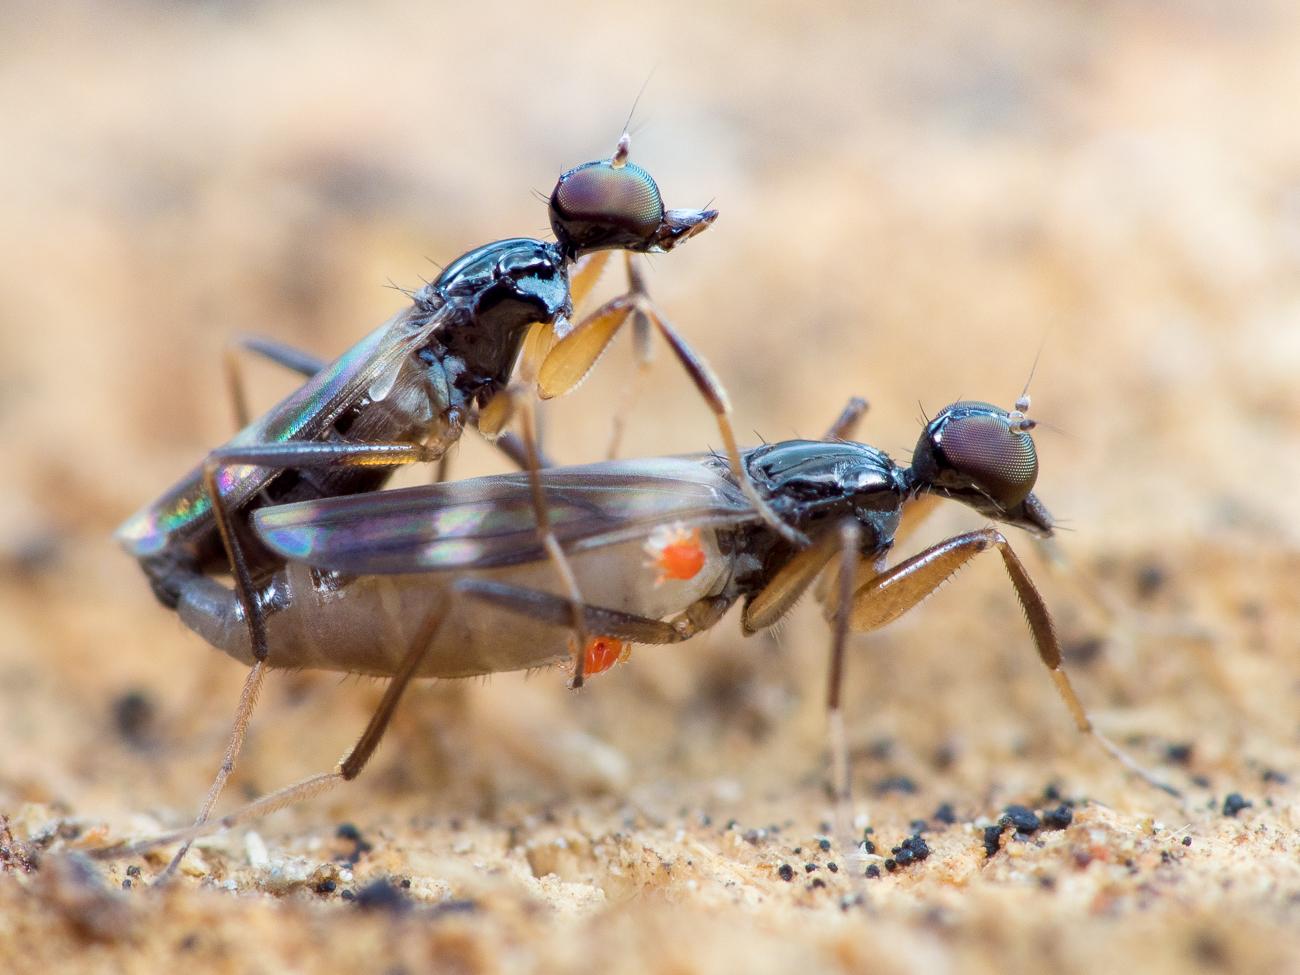 Tachydromia cf. umbrarum, puckeldansflugor